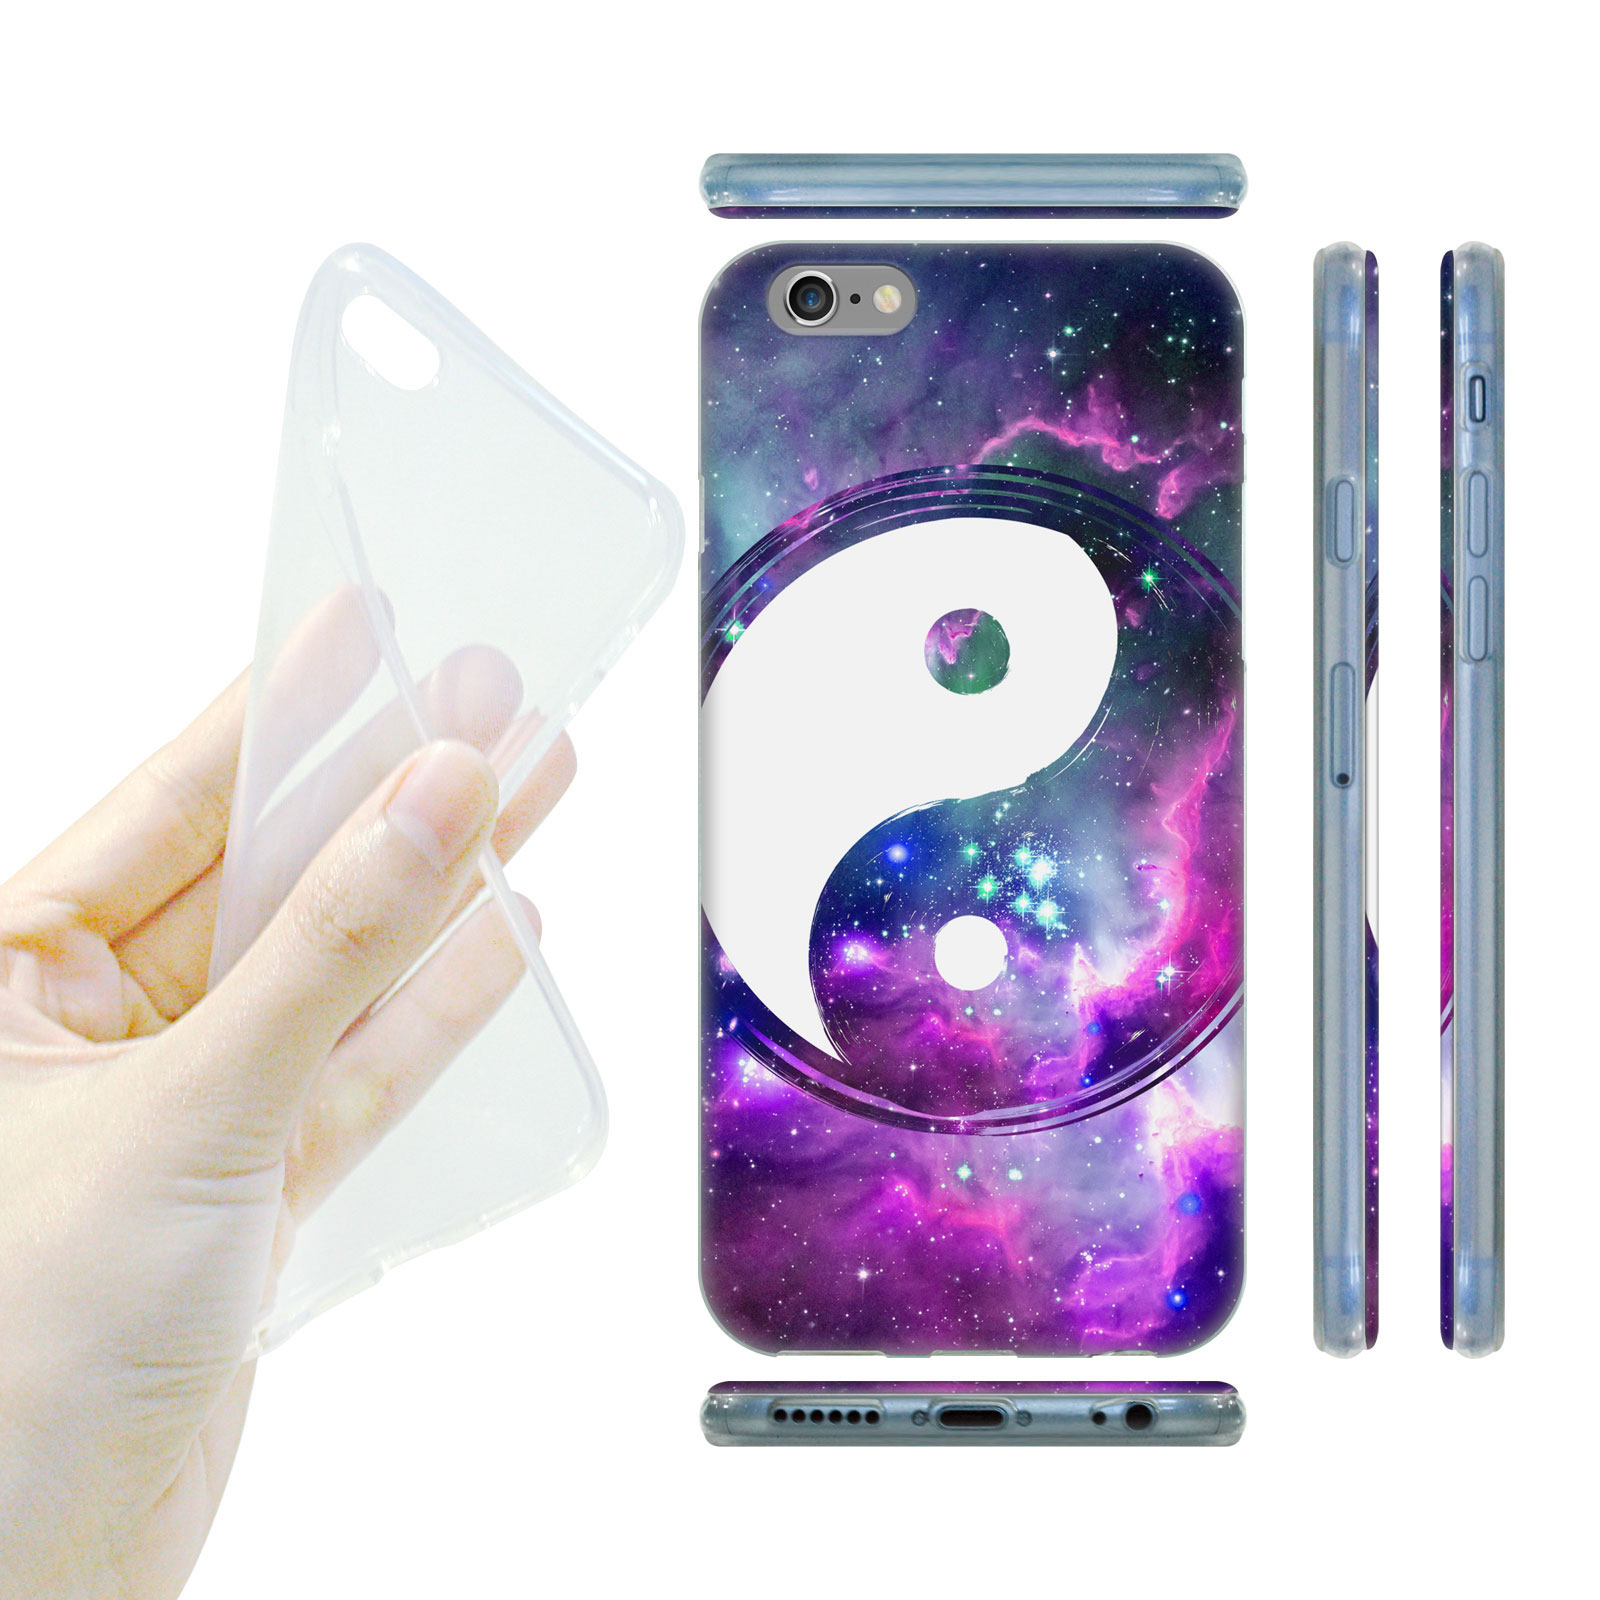 597430c78 HEAD CASE Silikonový obal na mobil Iphone 6/6S vzor JIN a JANG fialová